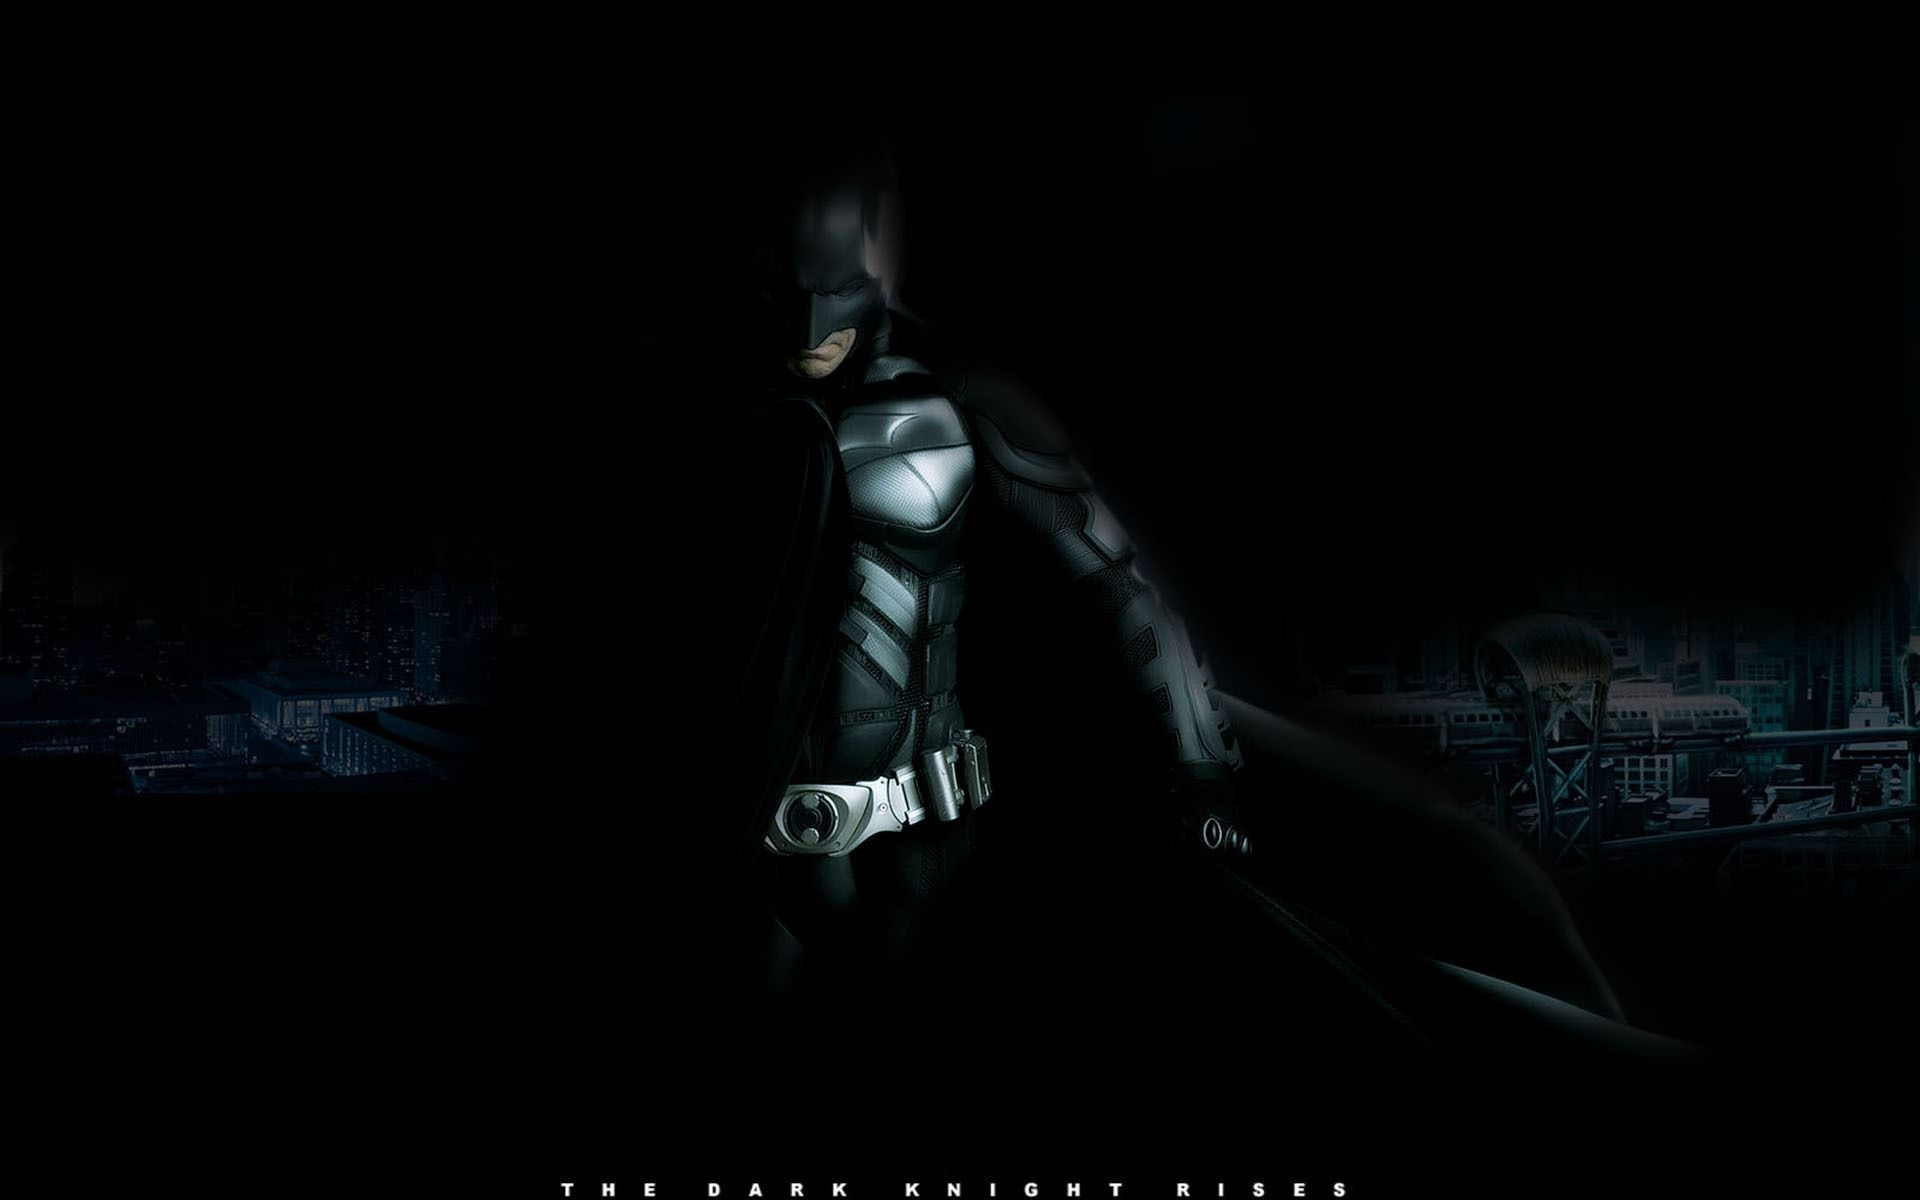 dark knight wallpapers - busca full hd wallpaper | batman